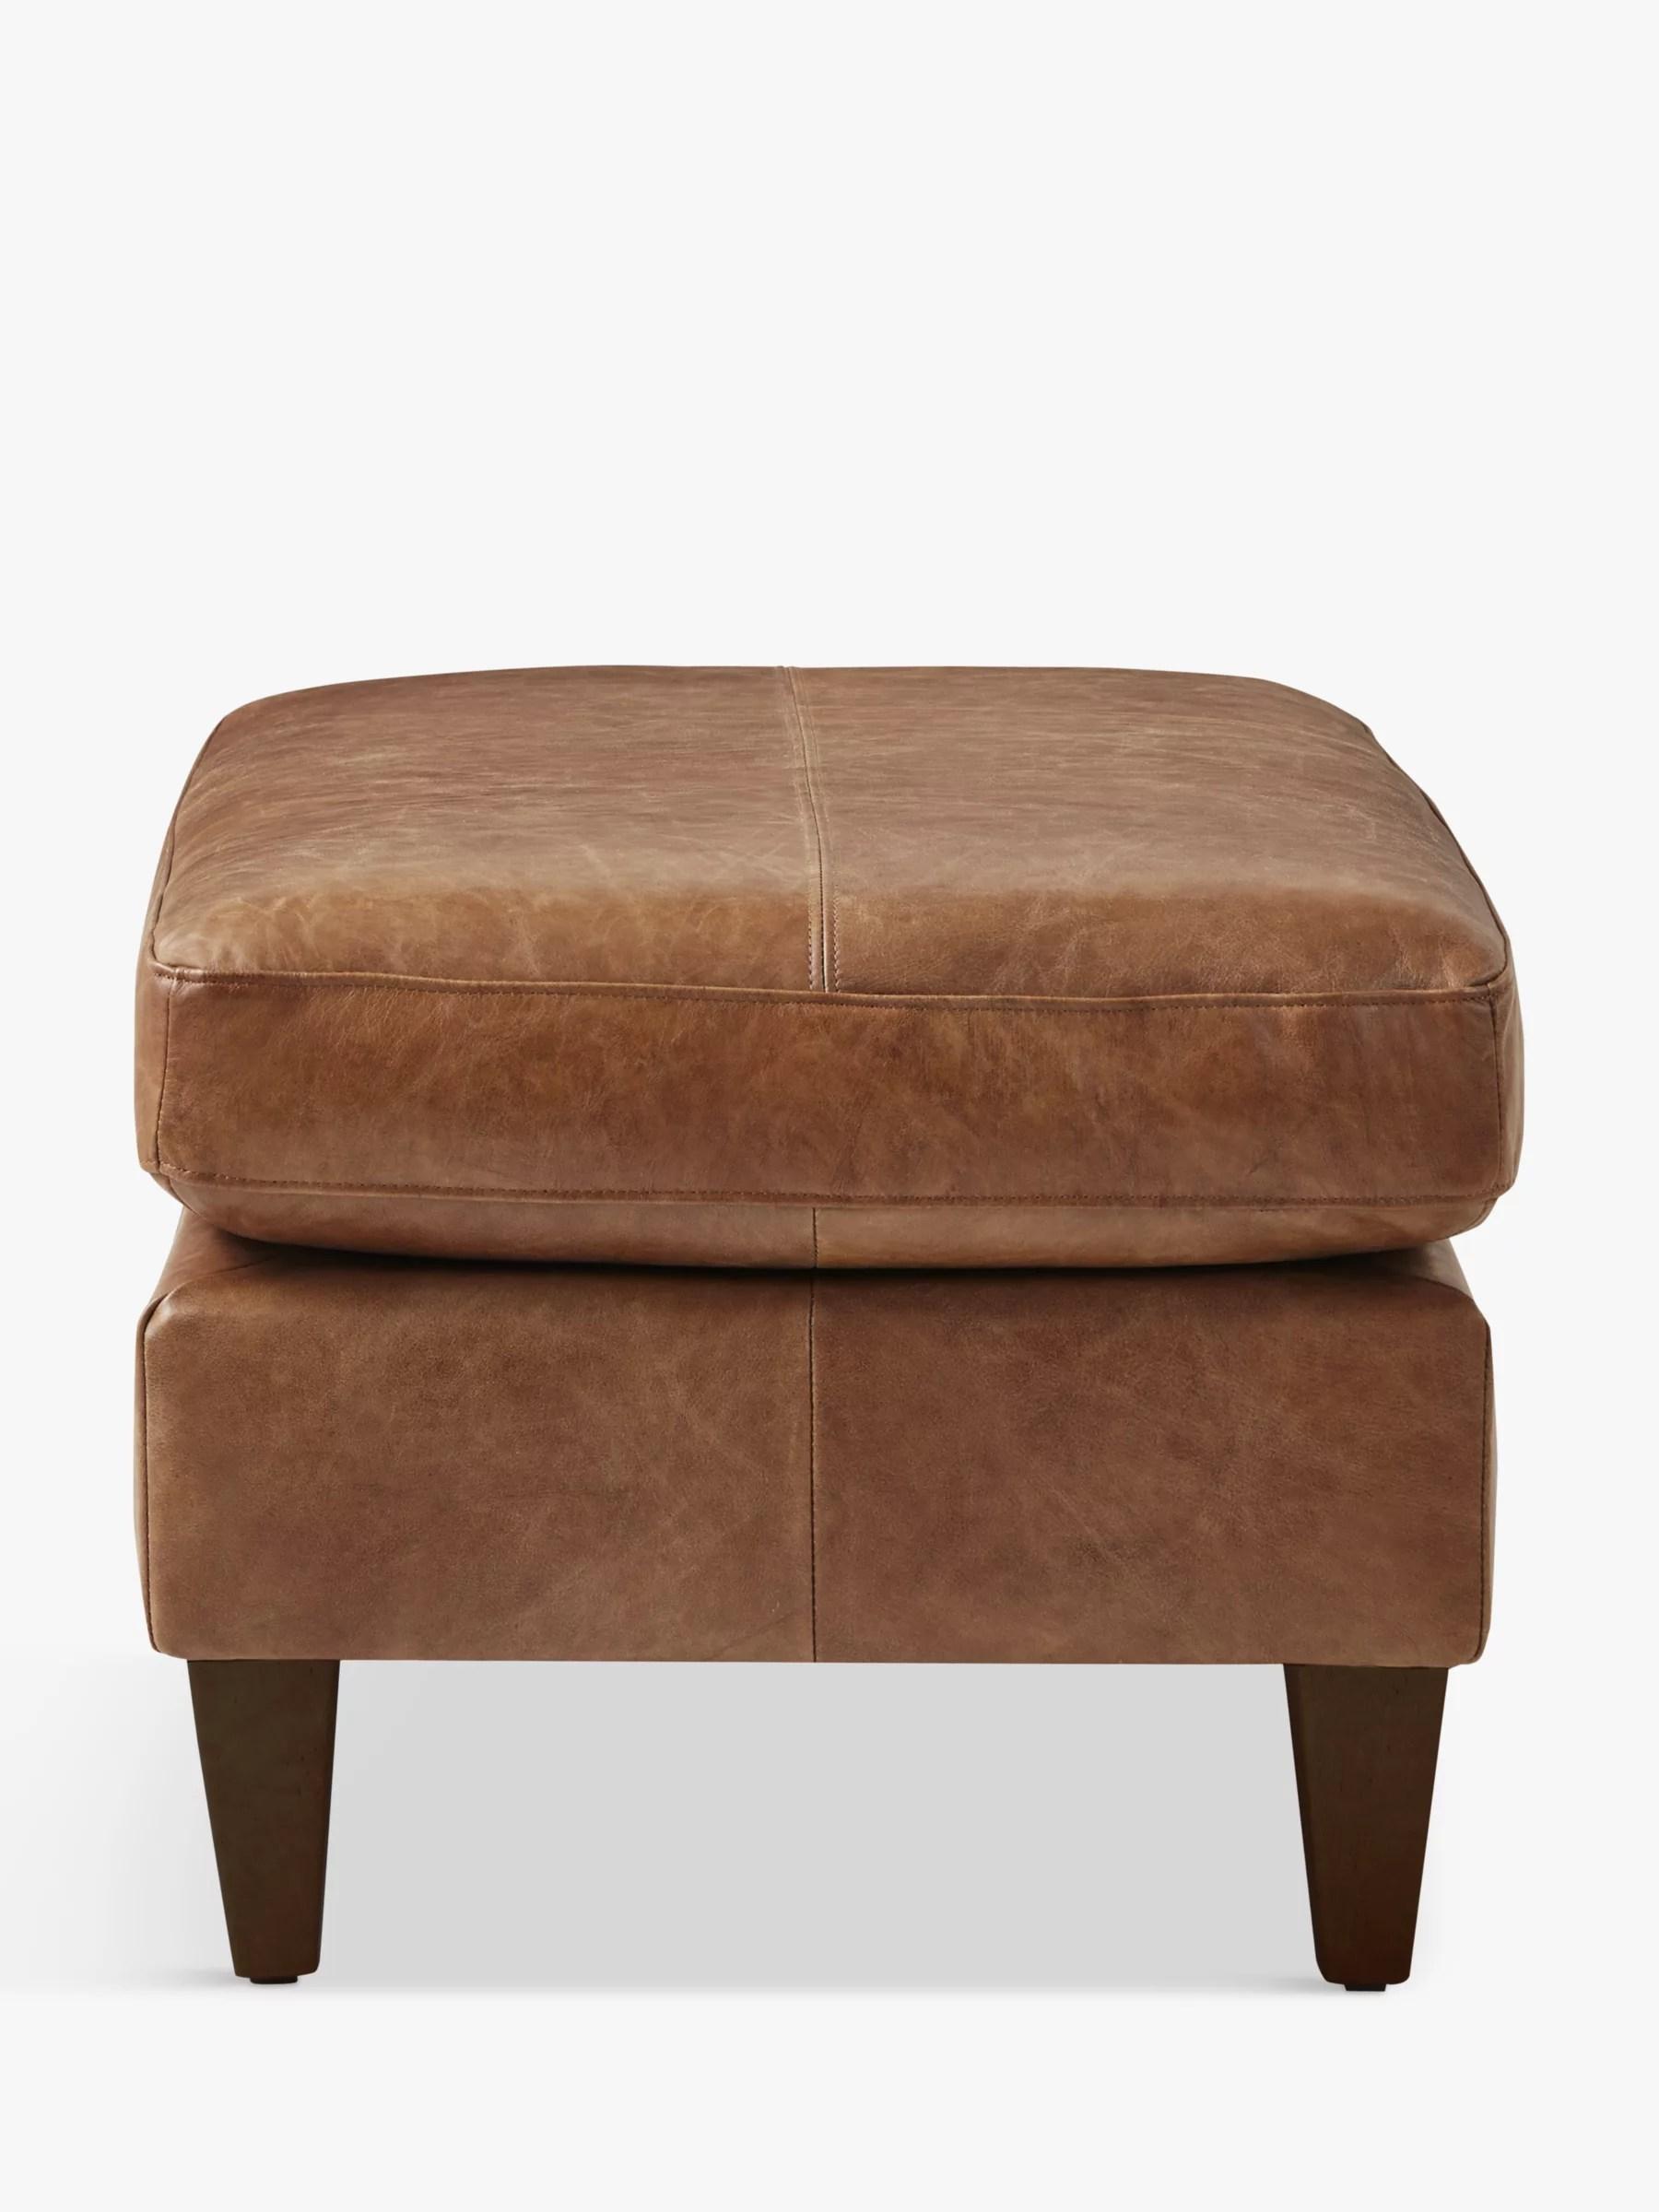 john lewis partners bailey leather footstool dark leg luster cappuccino